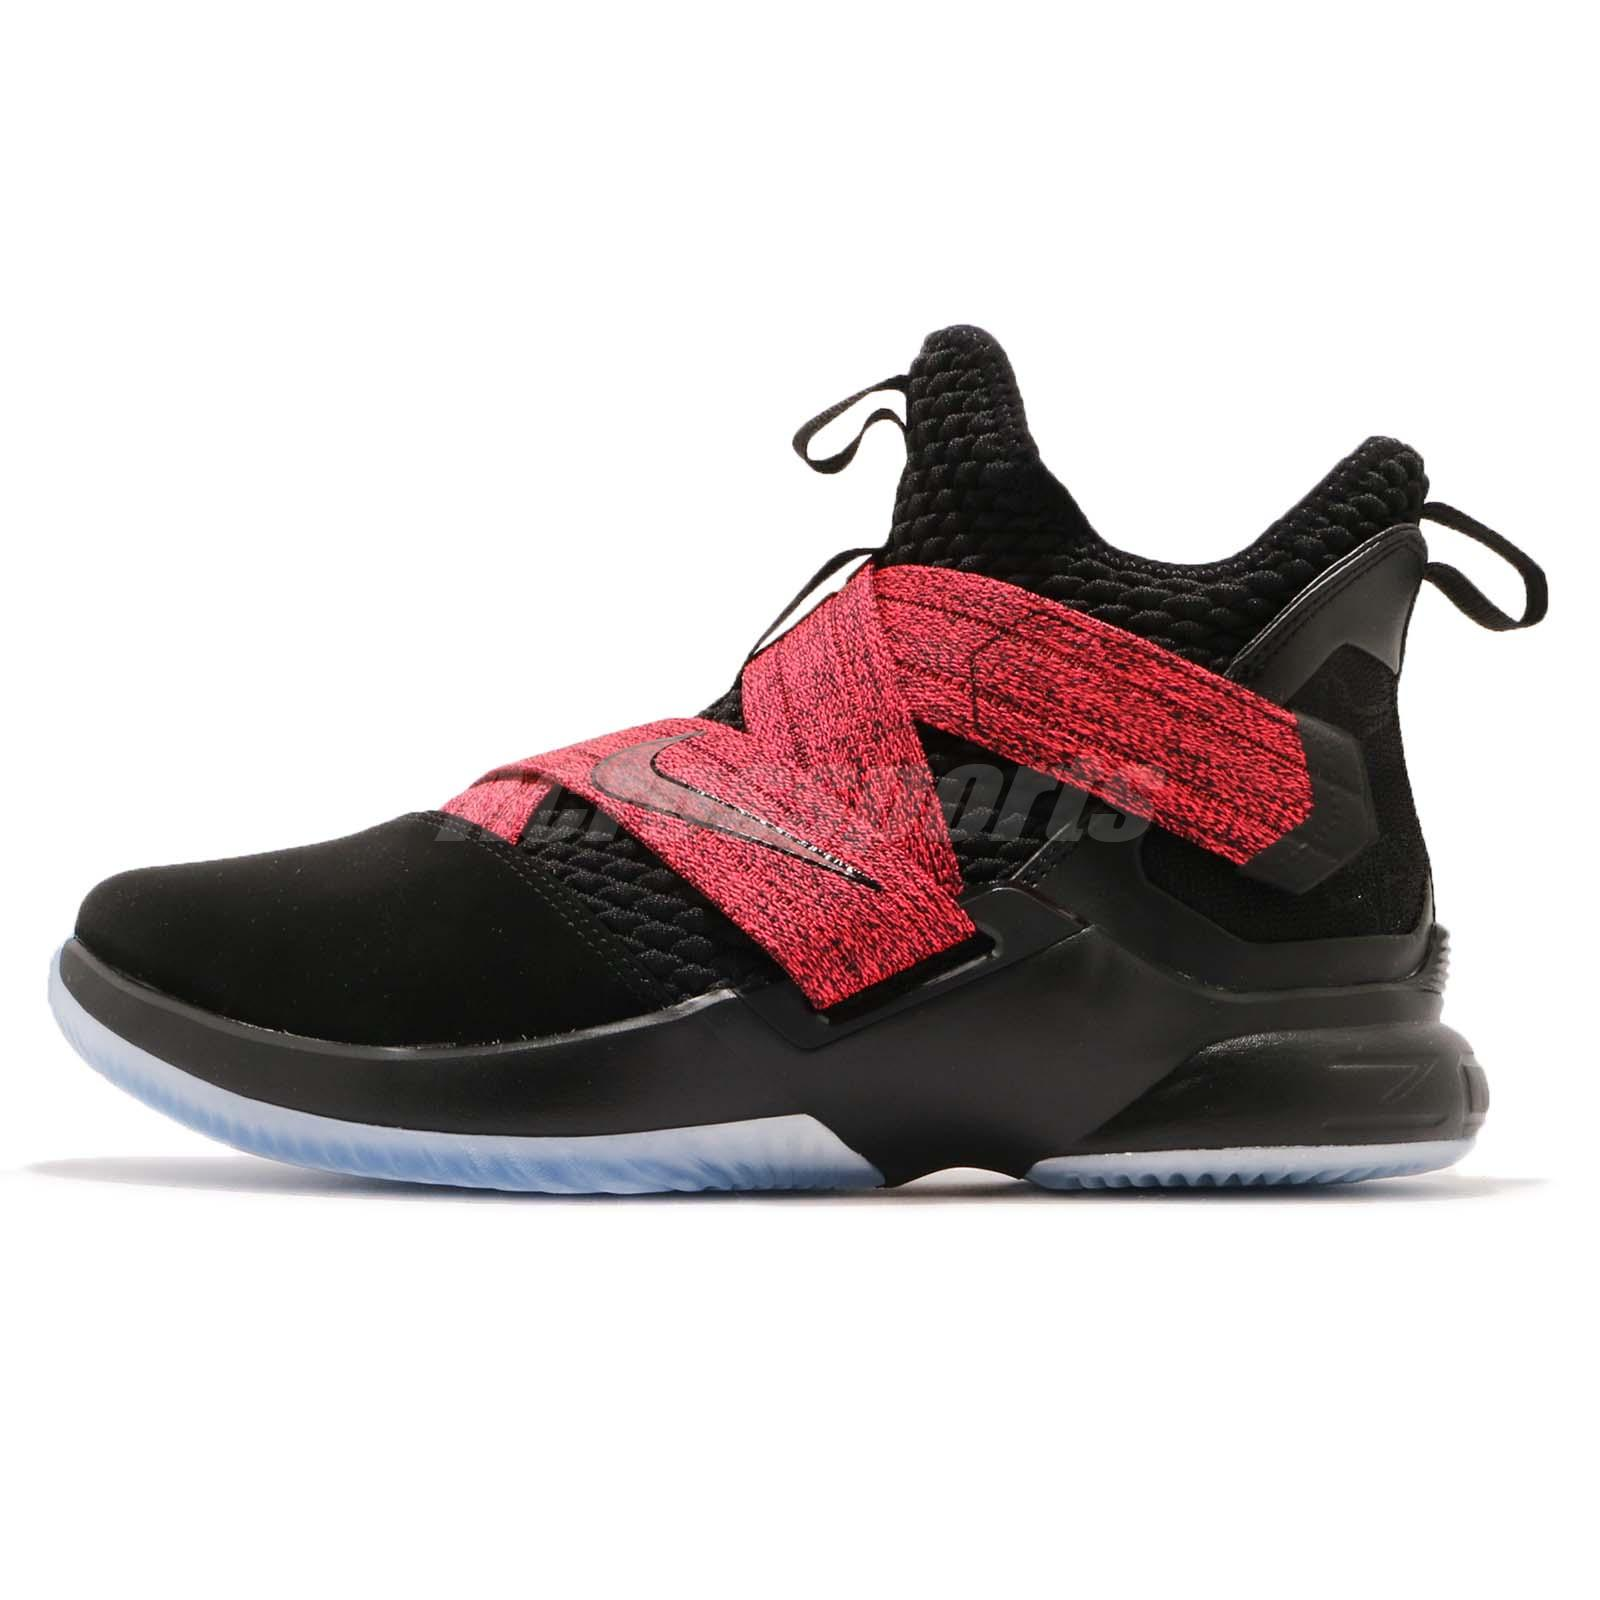 e80185fb79c Nike LeBron Soldier XII EP 12 James LBJ Black Red Men Basketball Shoe  AO4053-003